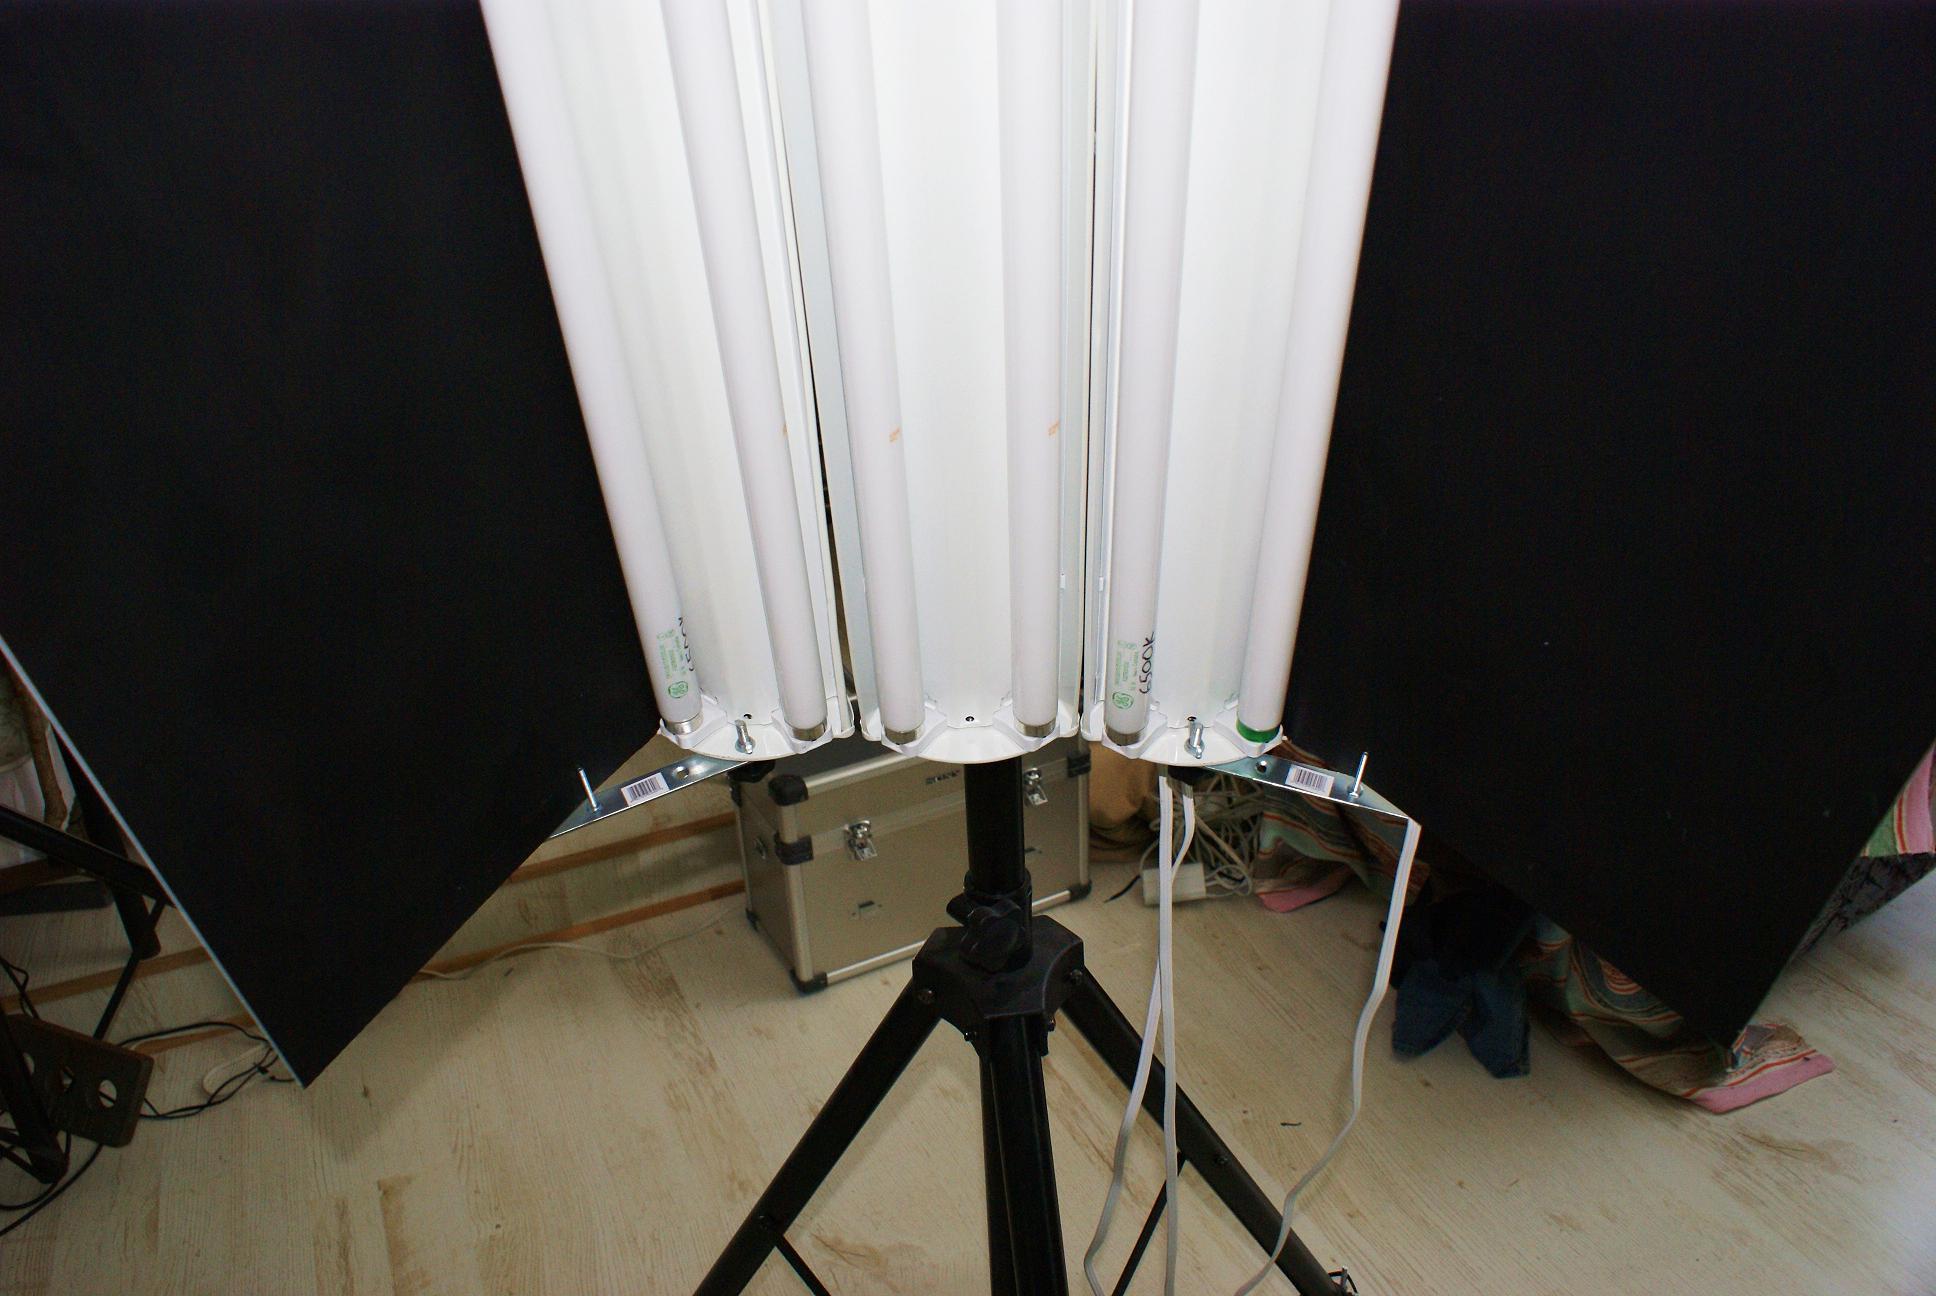 Diy Photography Lighting Kit Diy Do It Your Self